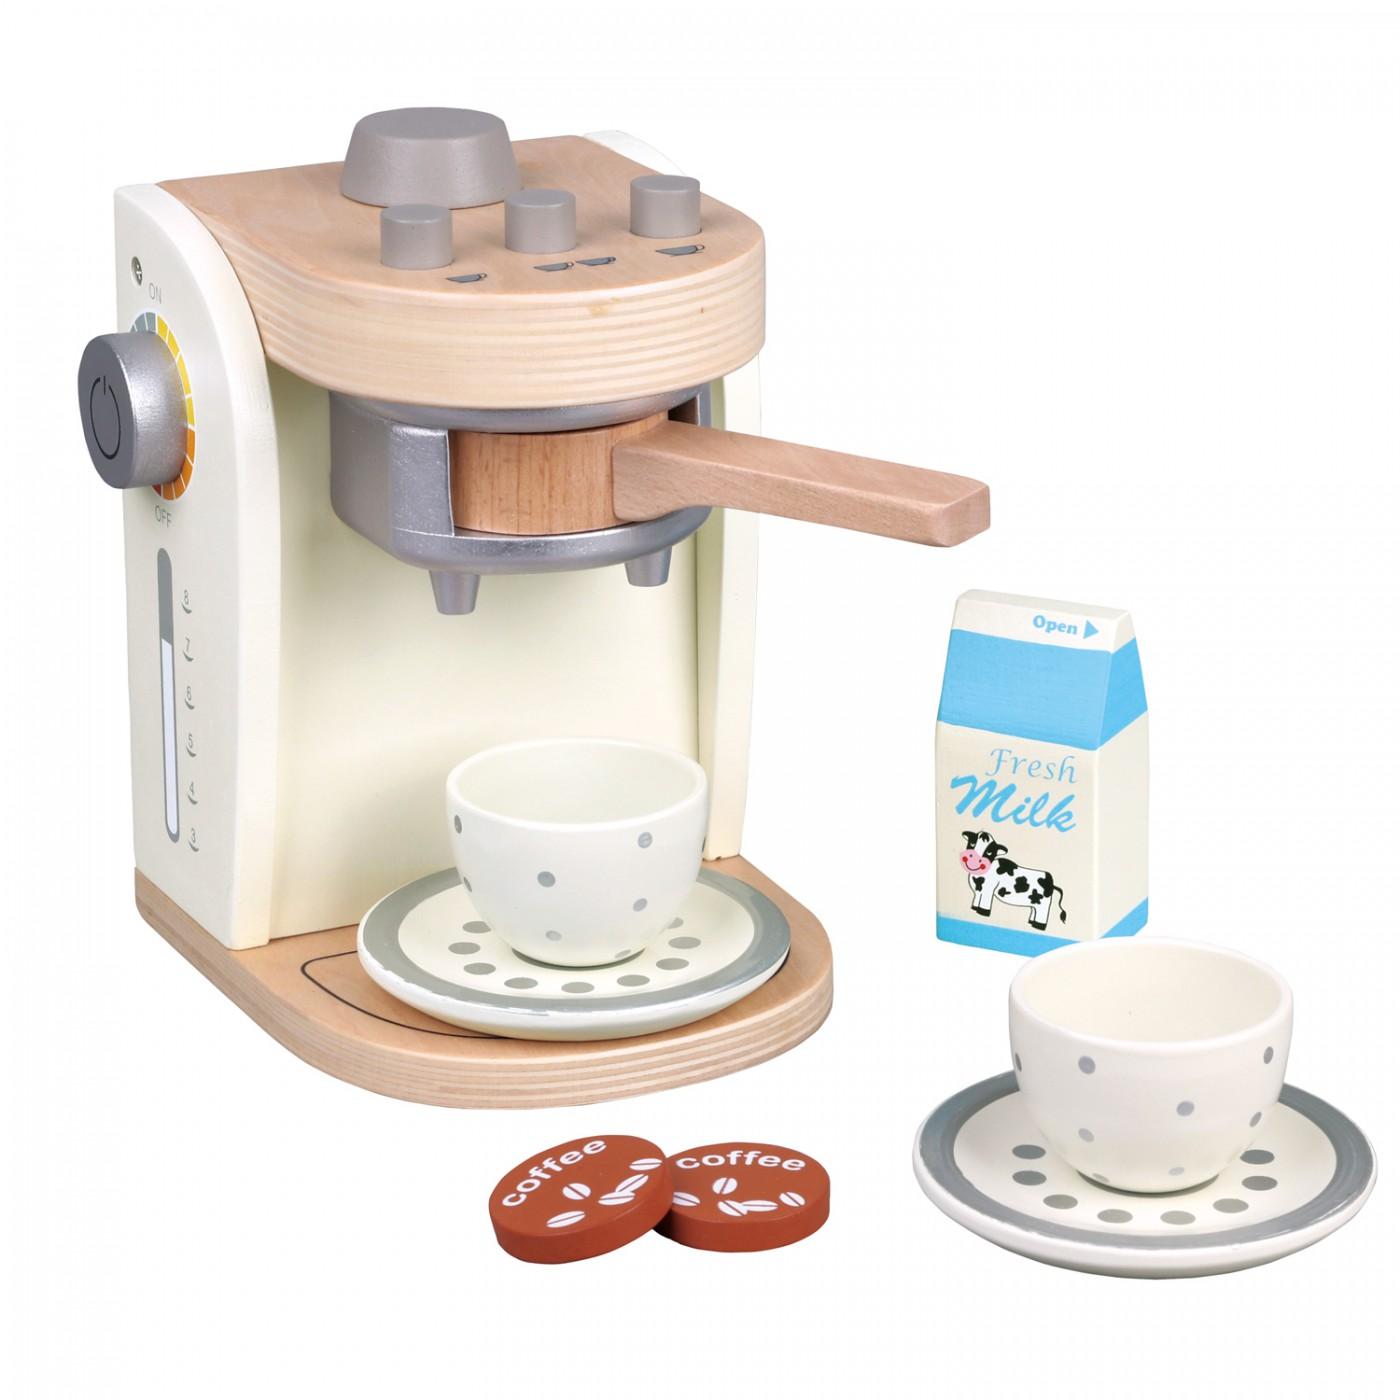 Kaffemaschine - Creme